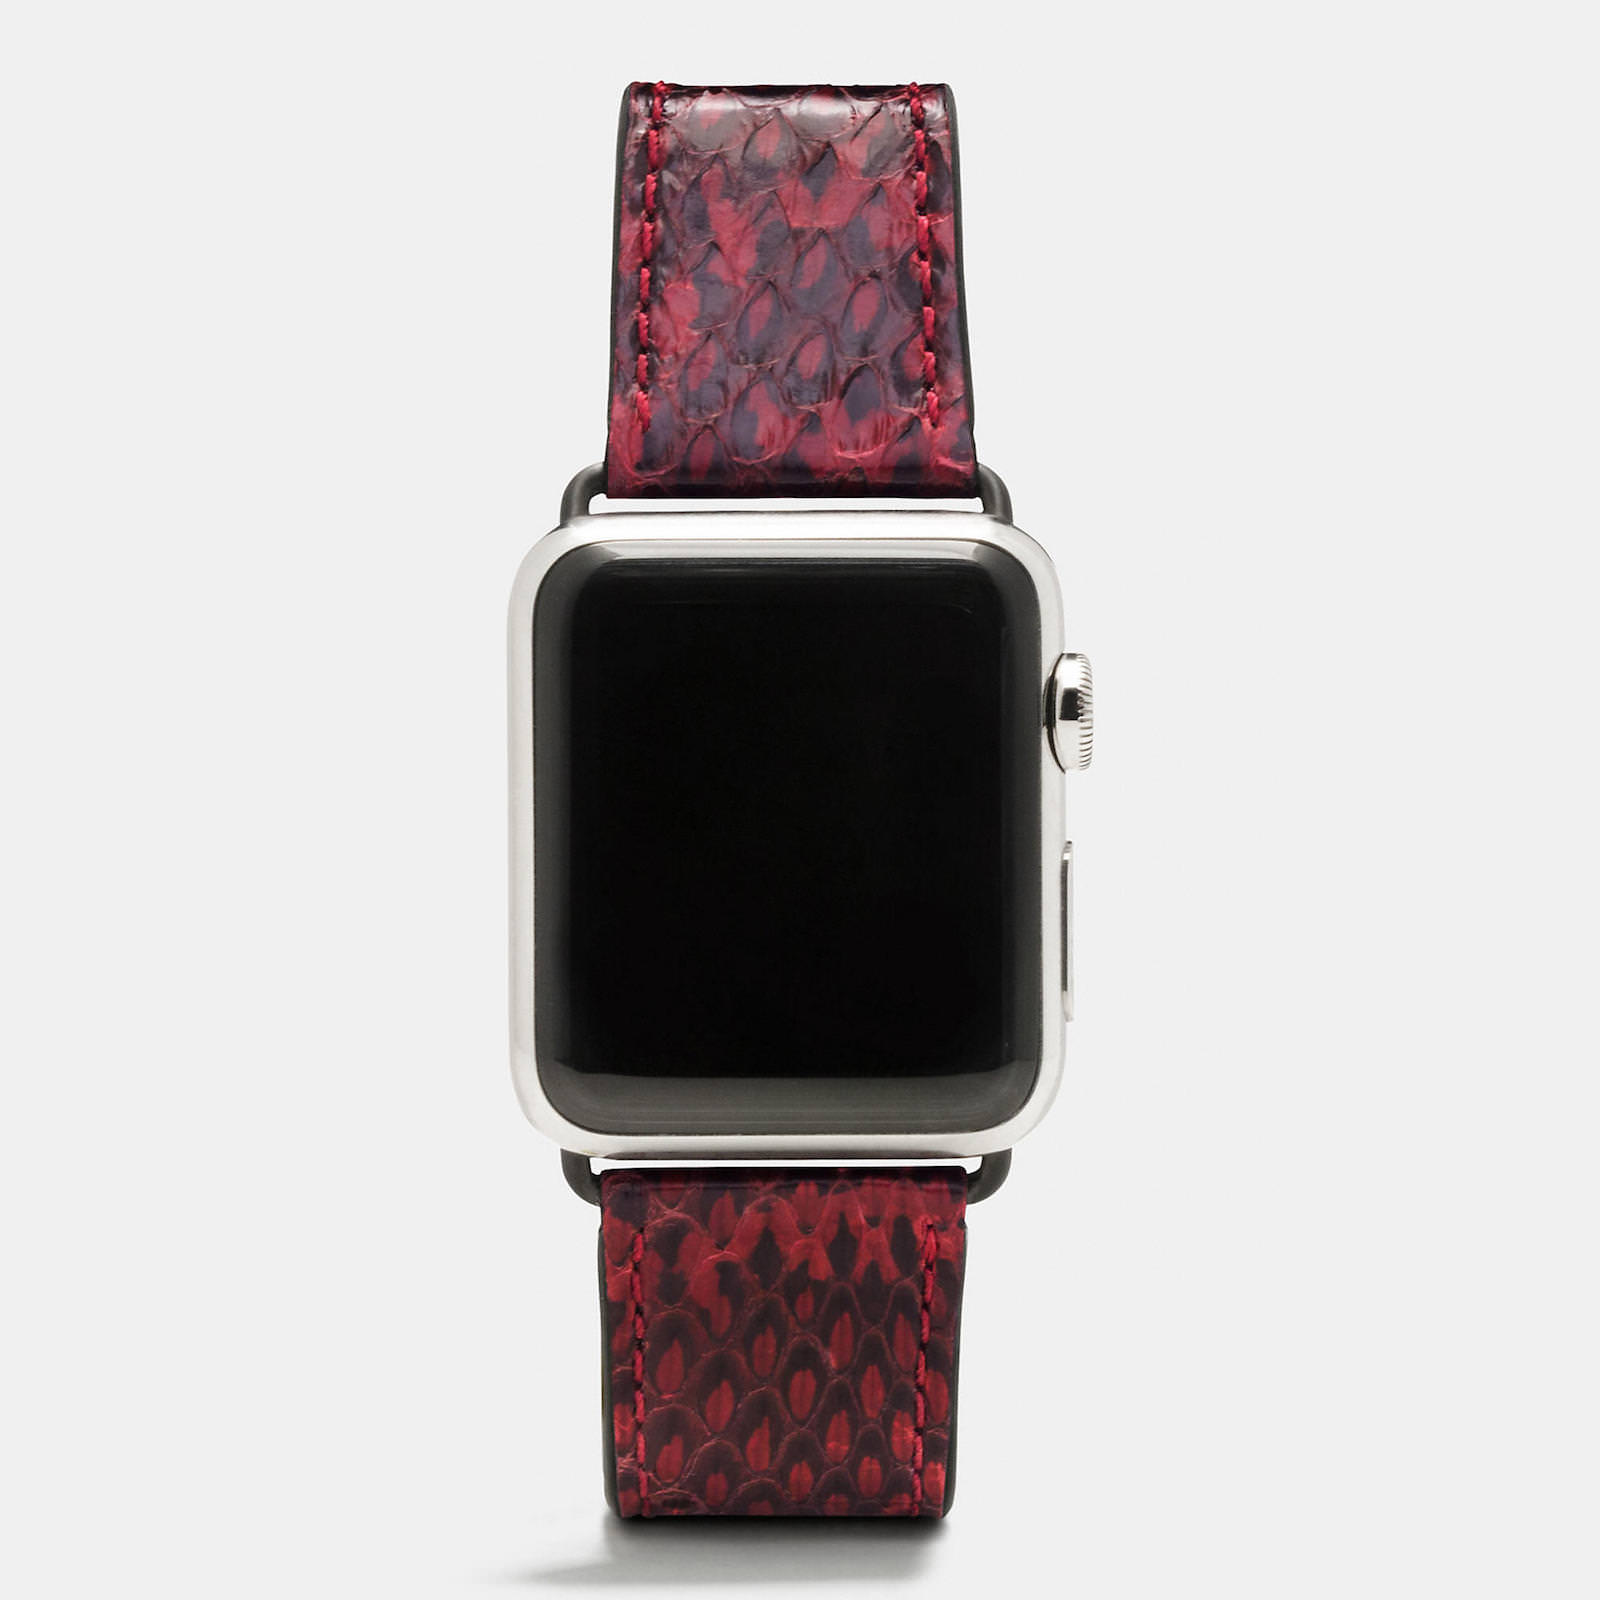 Apple-Watch-Coach-Band-Autumn-Season-4.jpeg